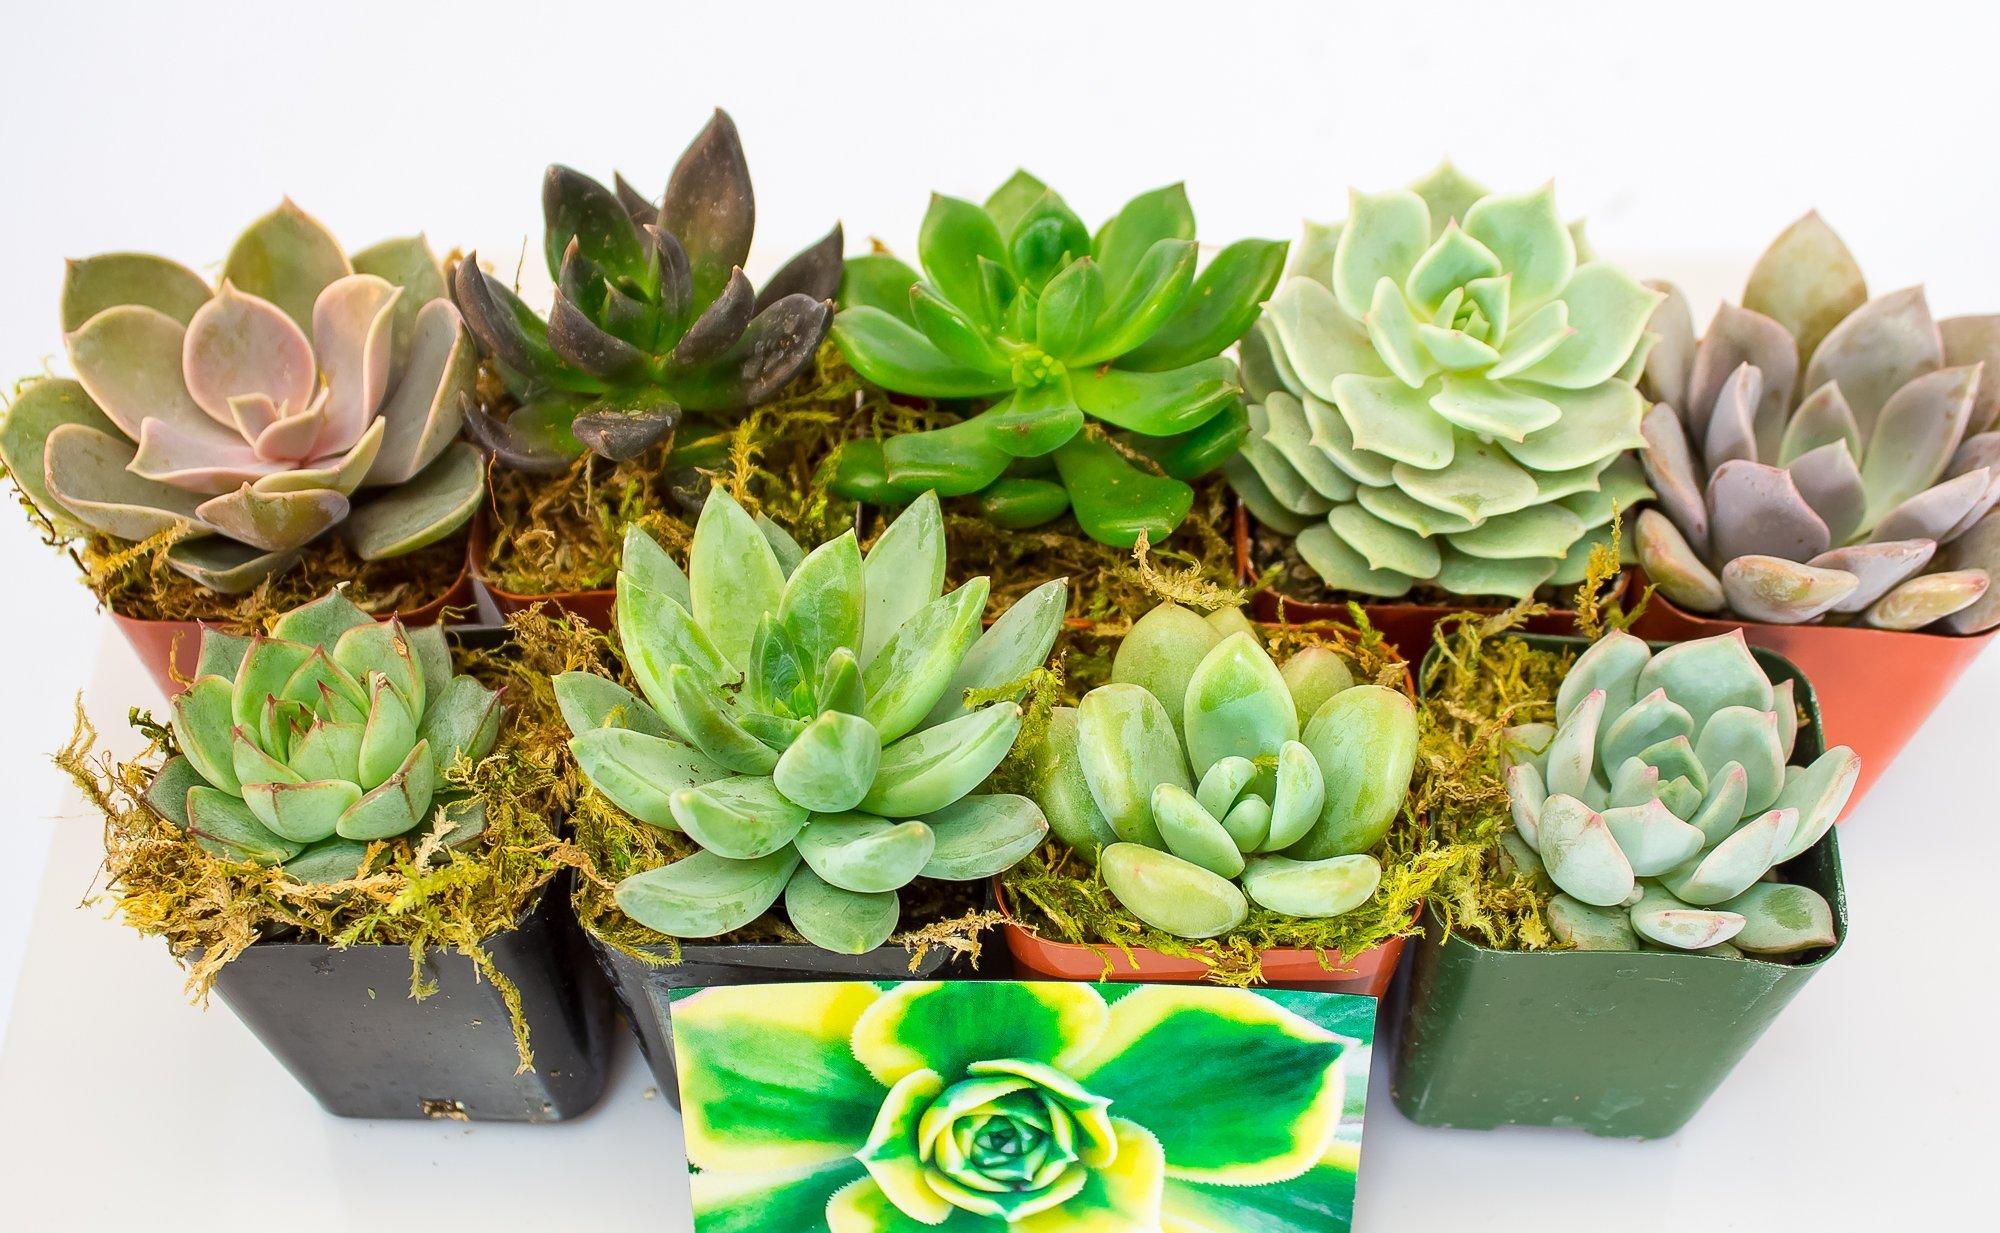 Fat Plants San Diego All Rosette Succulent Plants in 2 Inch Pots (9)